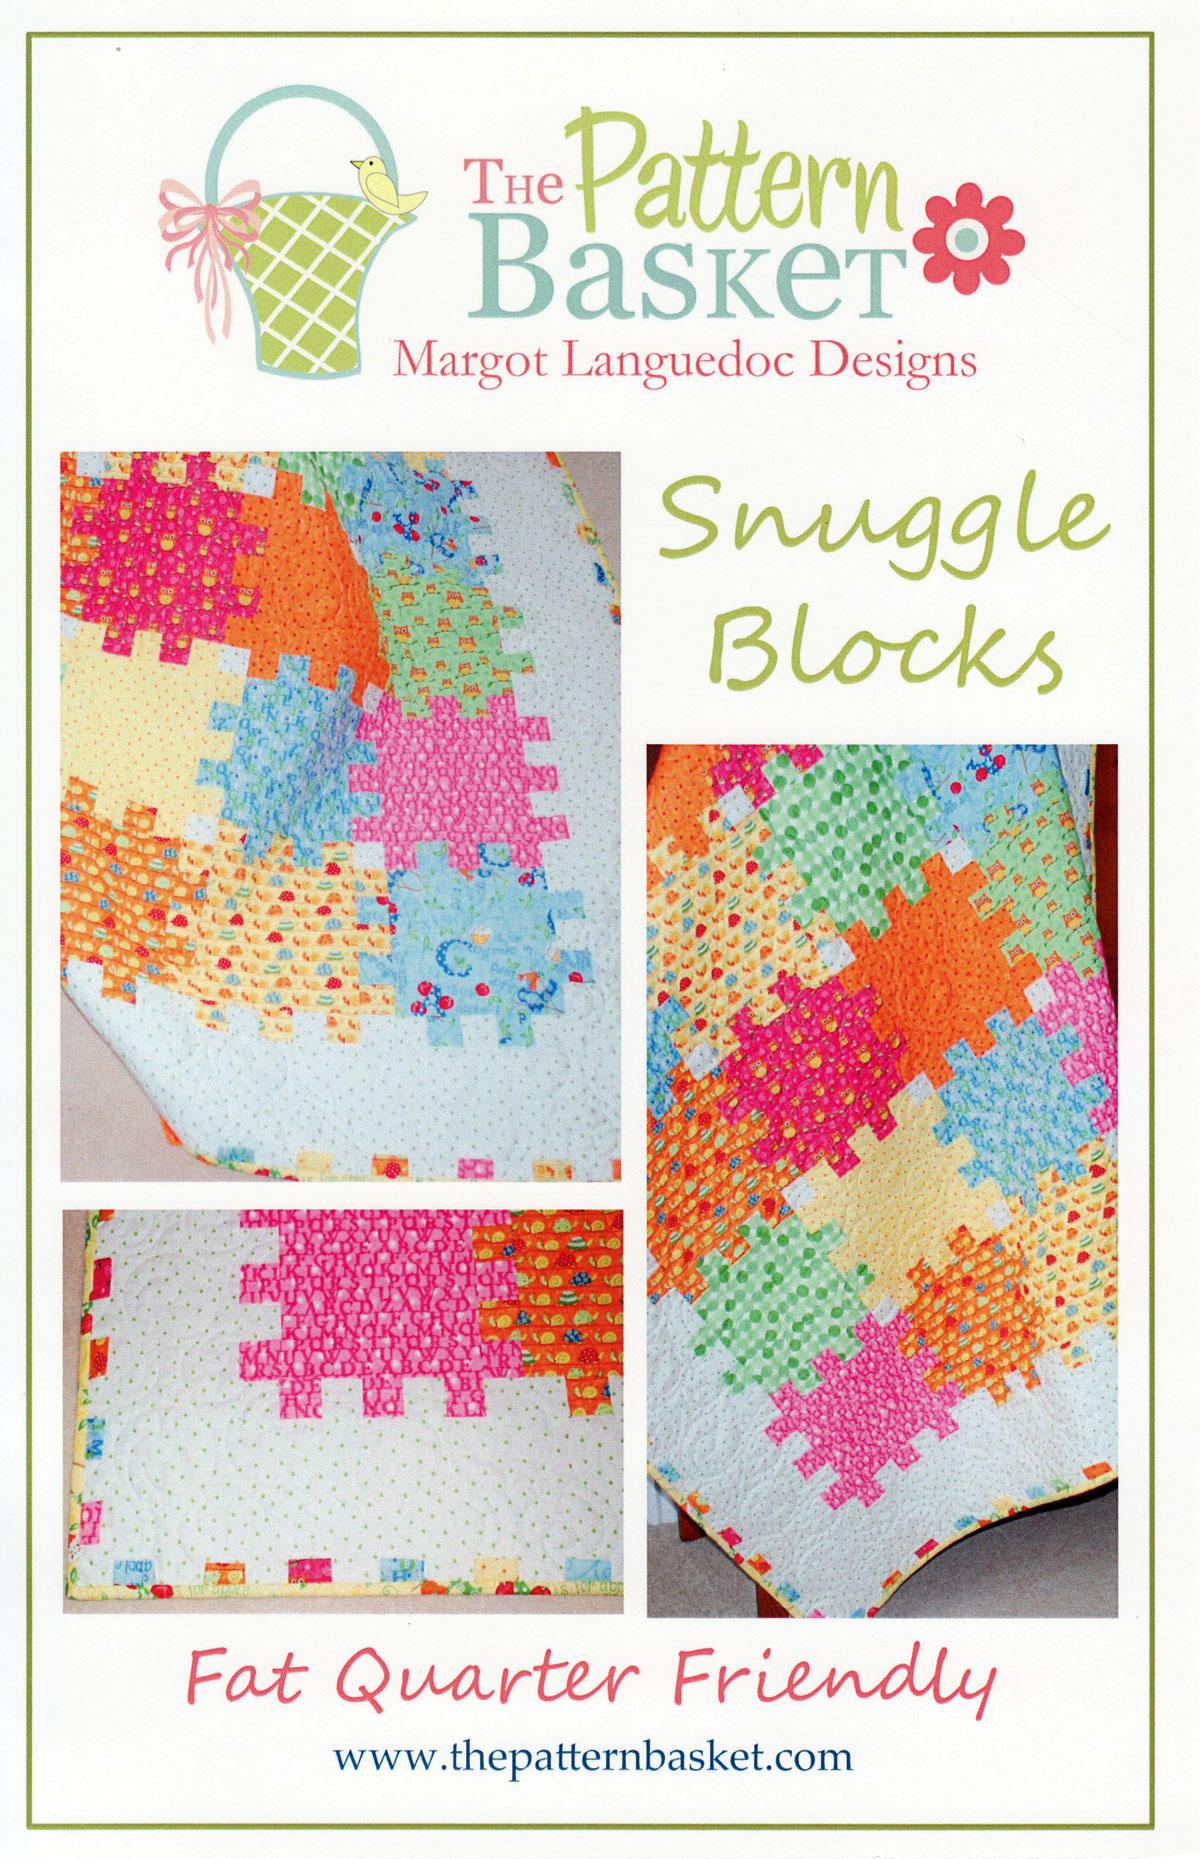 Snuggle-Blocks-sewing-pattern-the-pattern-basket-front